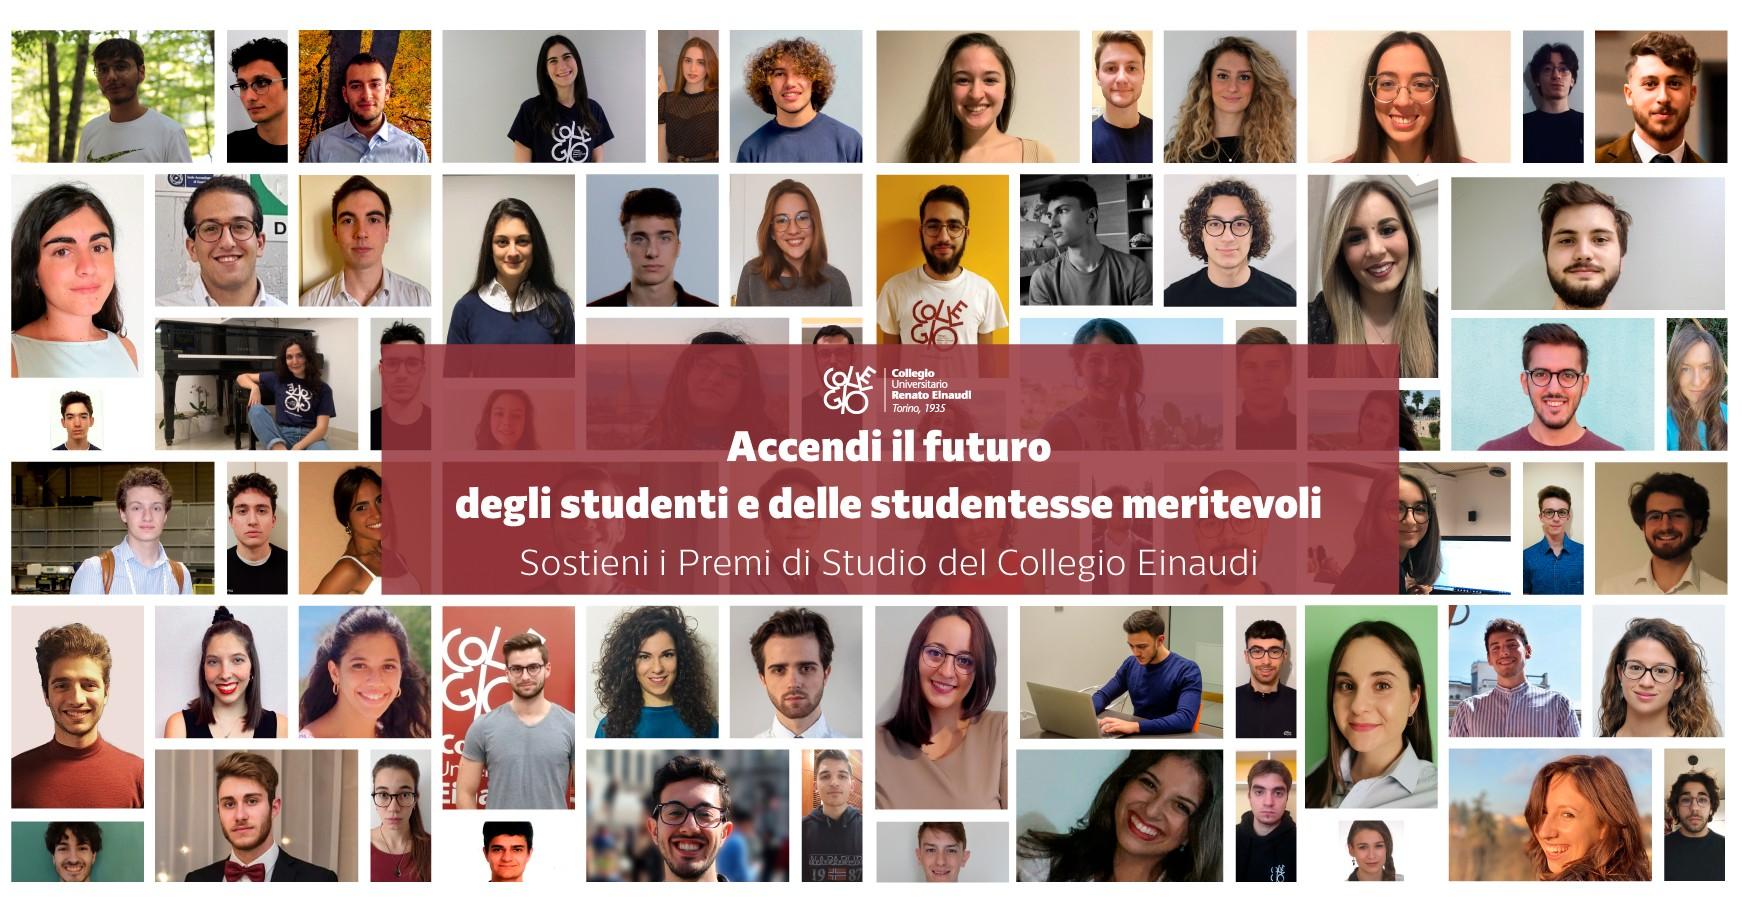 Premi di Studio-Collegio Universitario Einaudi